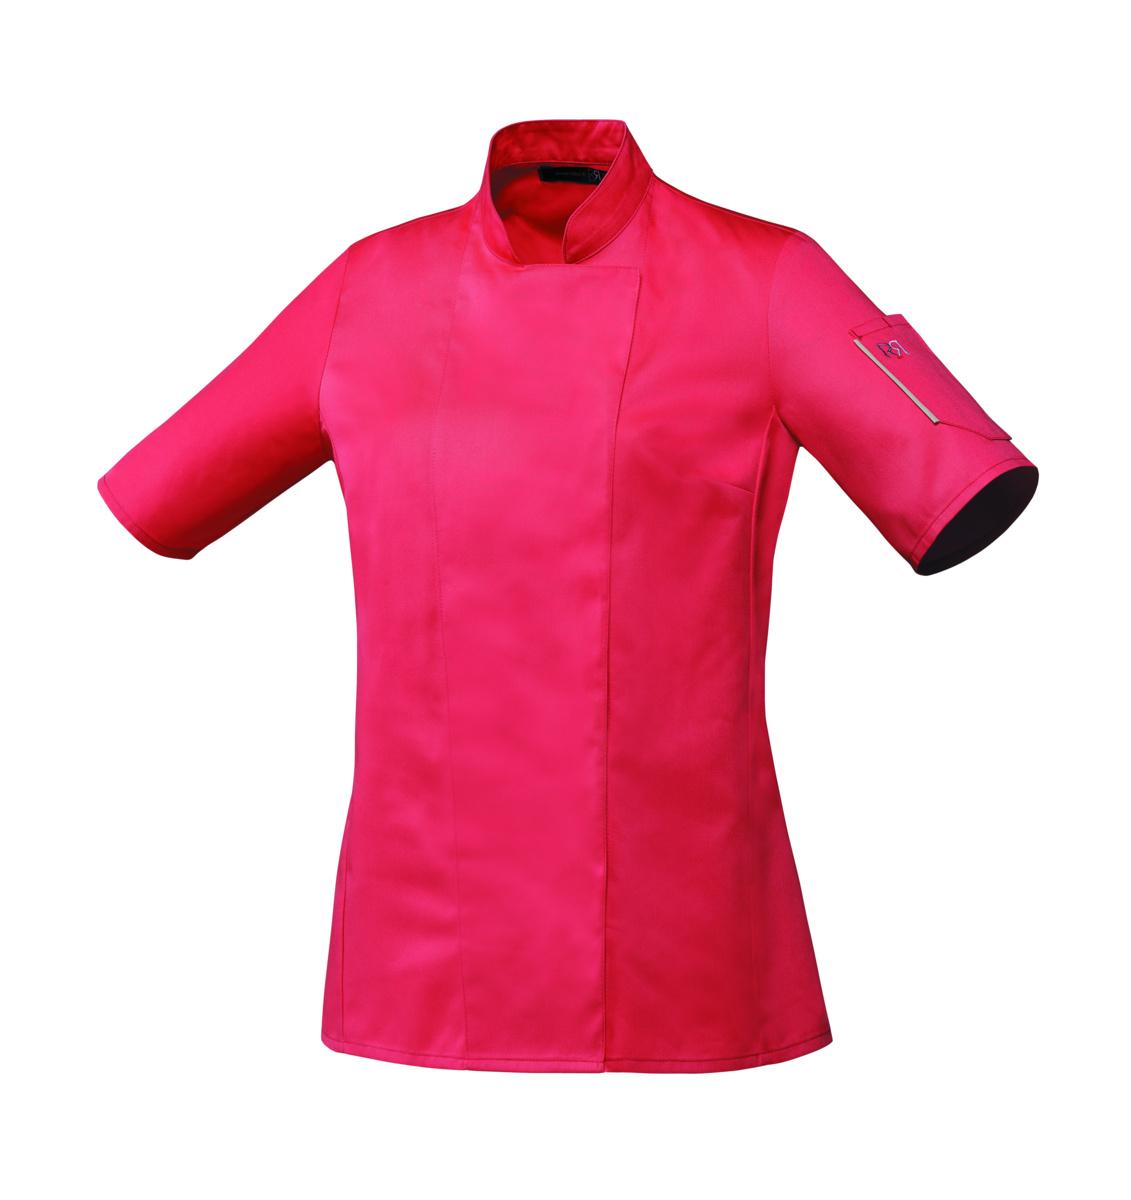 Veste femme rose taille 3 Unera Robur